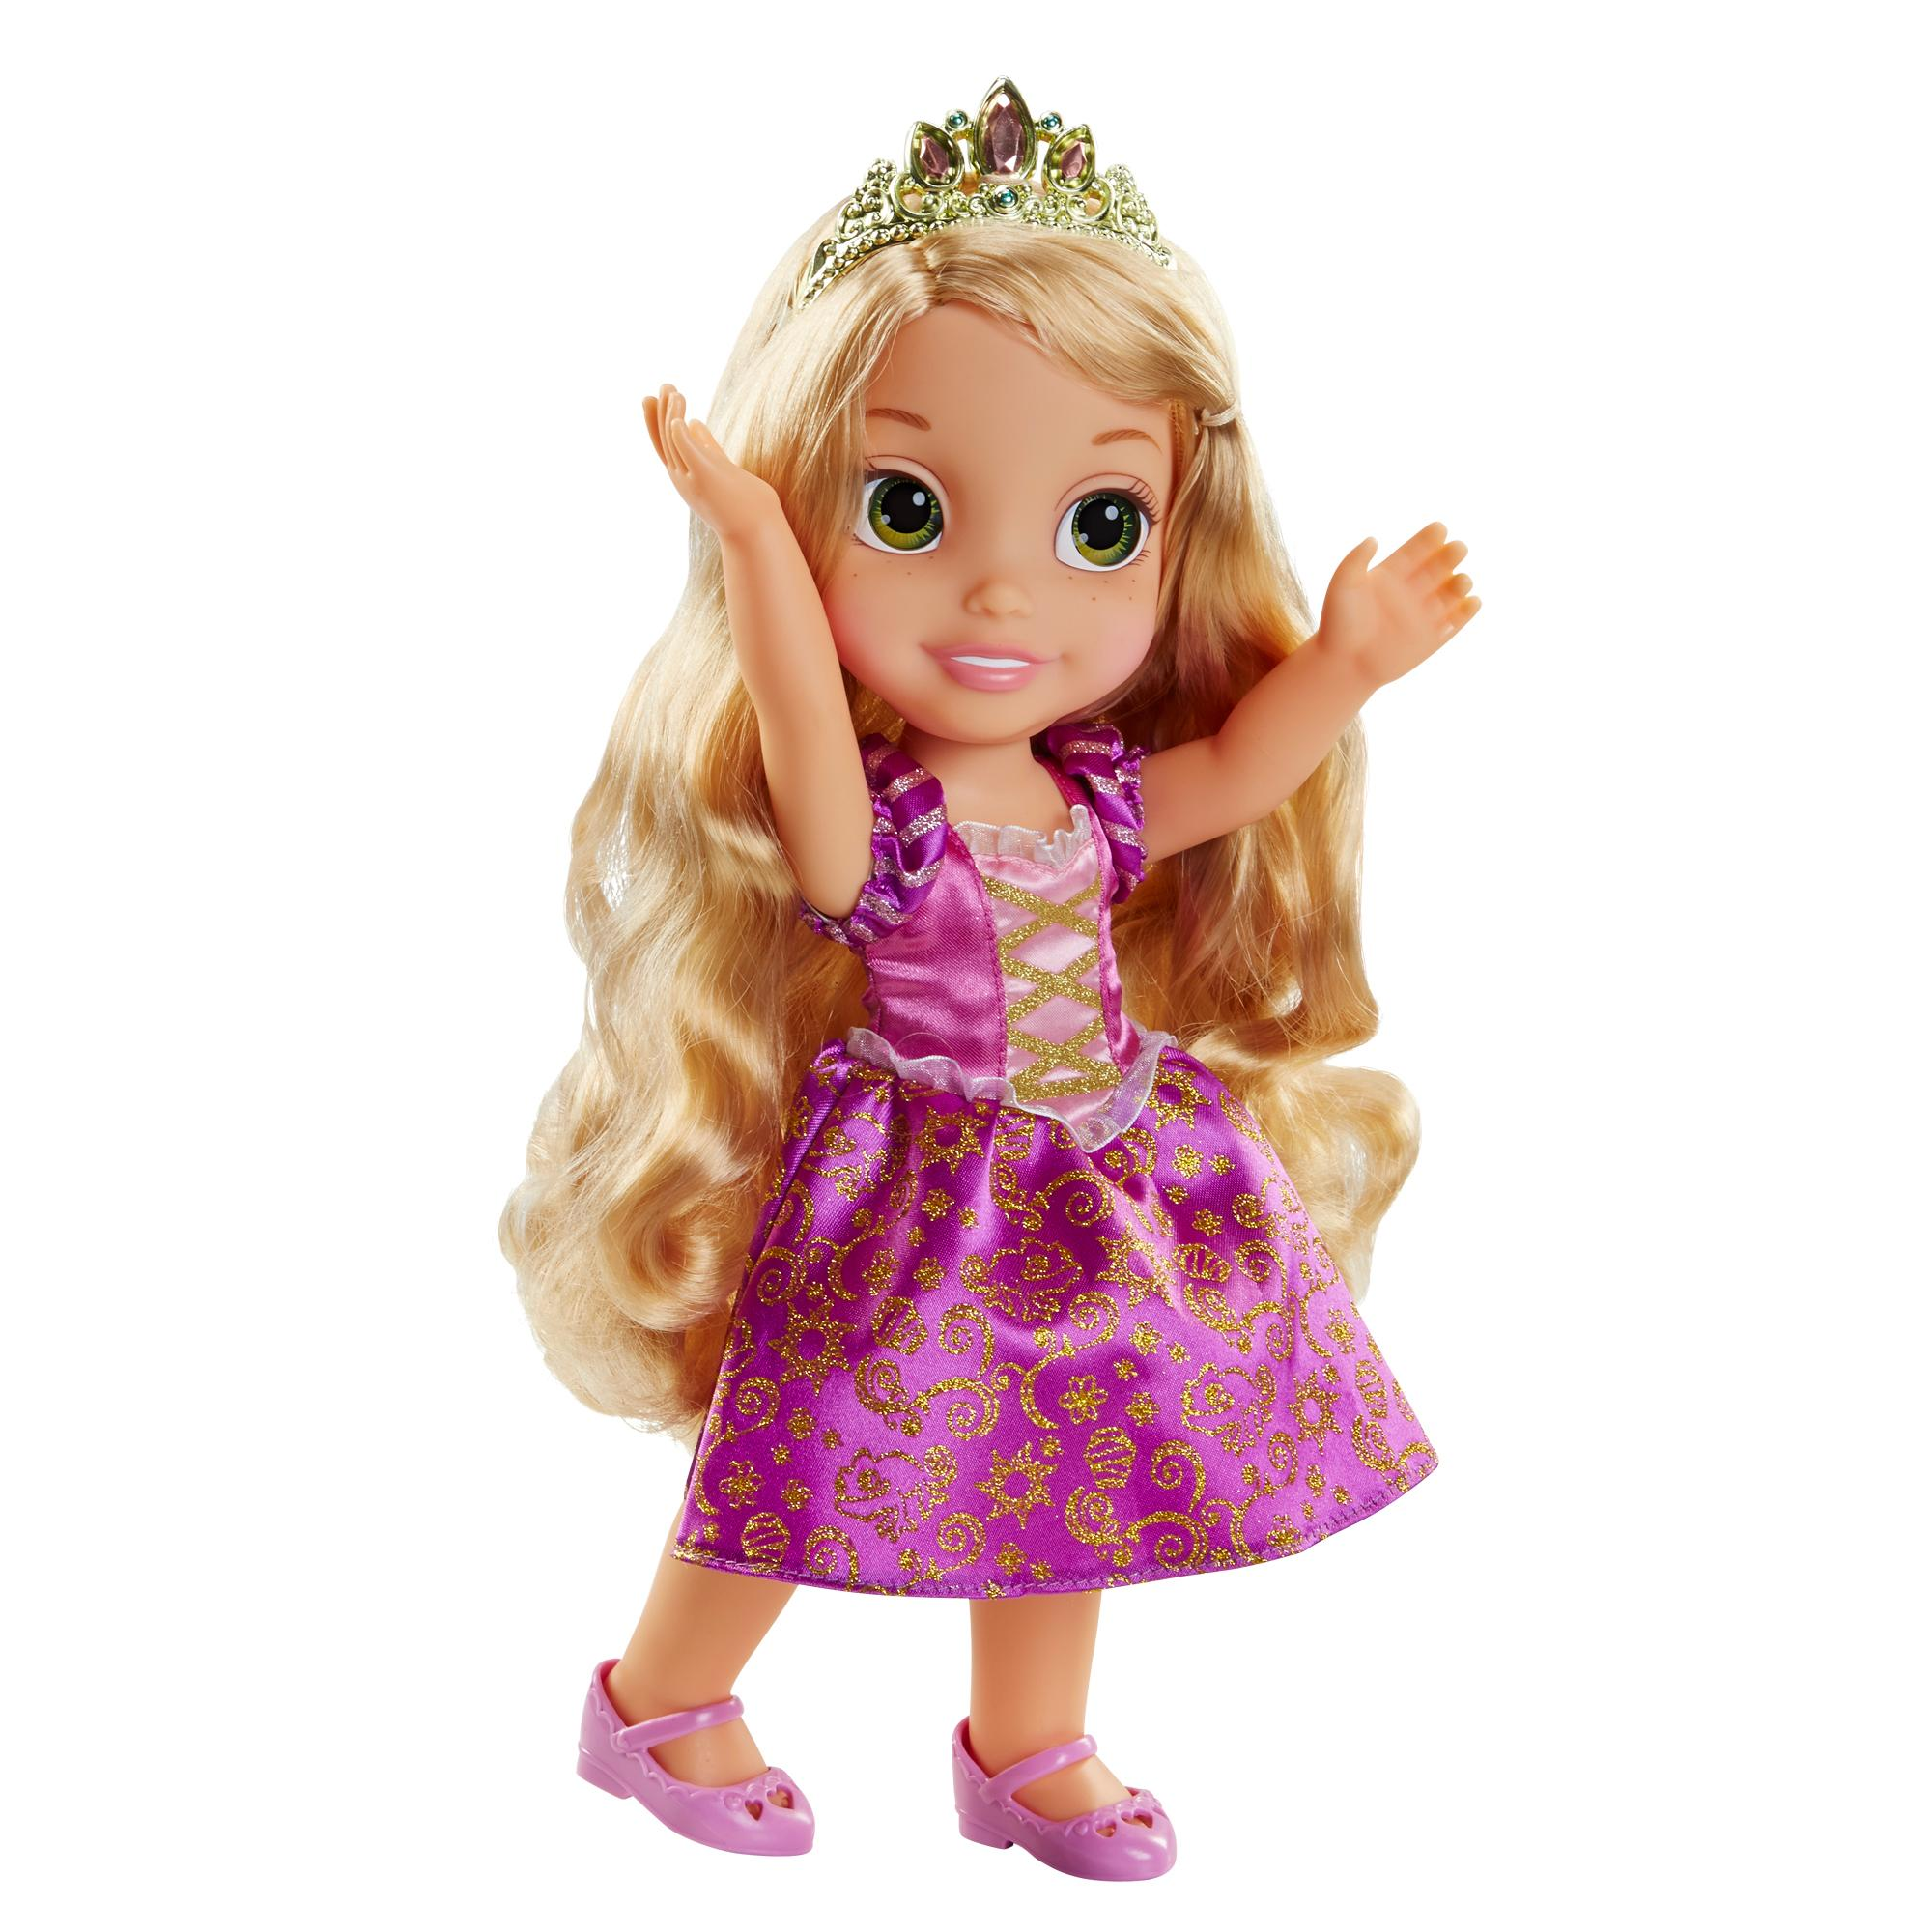 Amazon Com Disney Princess Baby Belle Doll Toys Games: Amazon.com: Disney Princess Belle Toddler Doll: Toys & Games